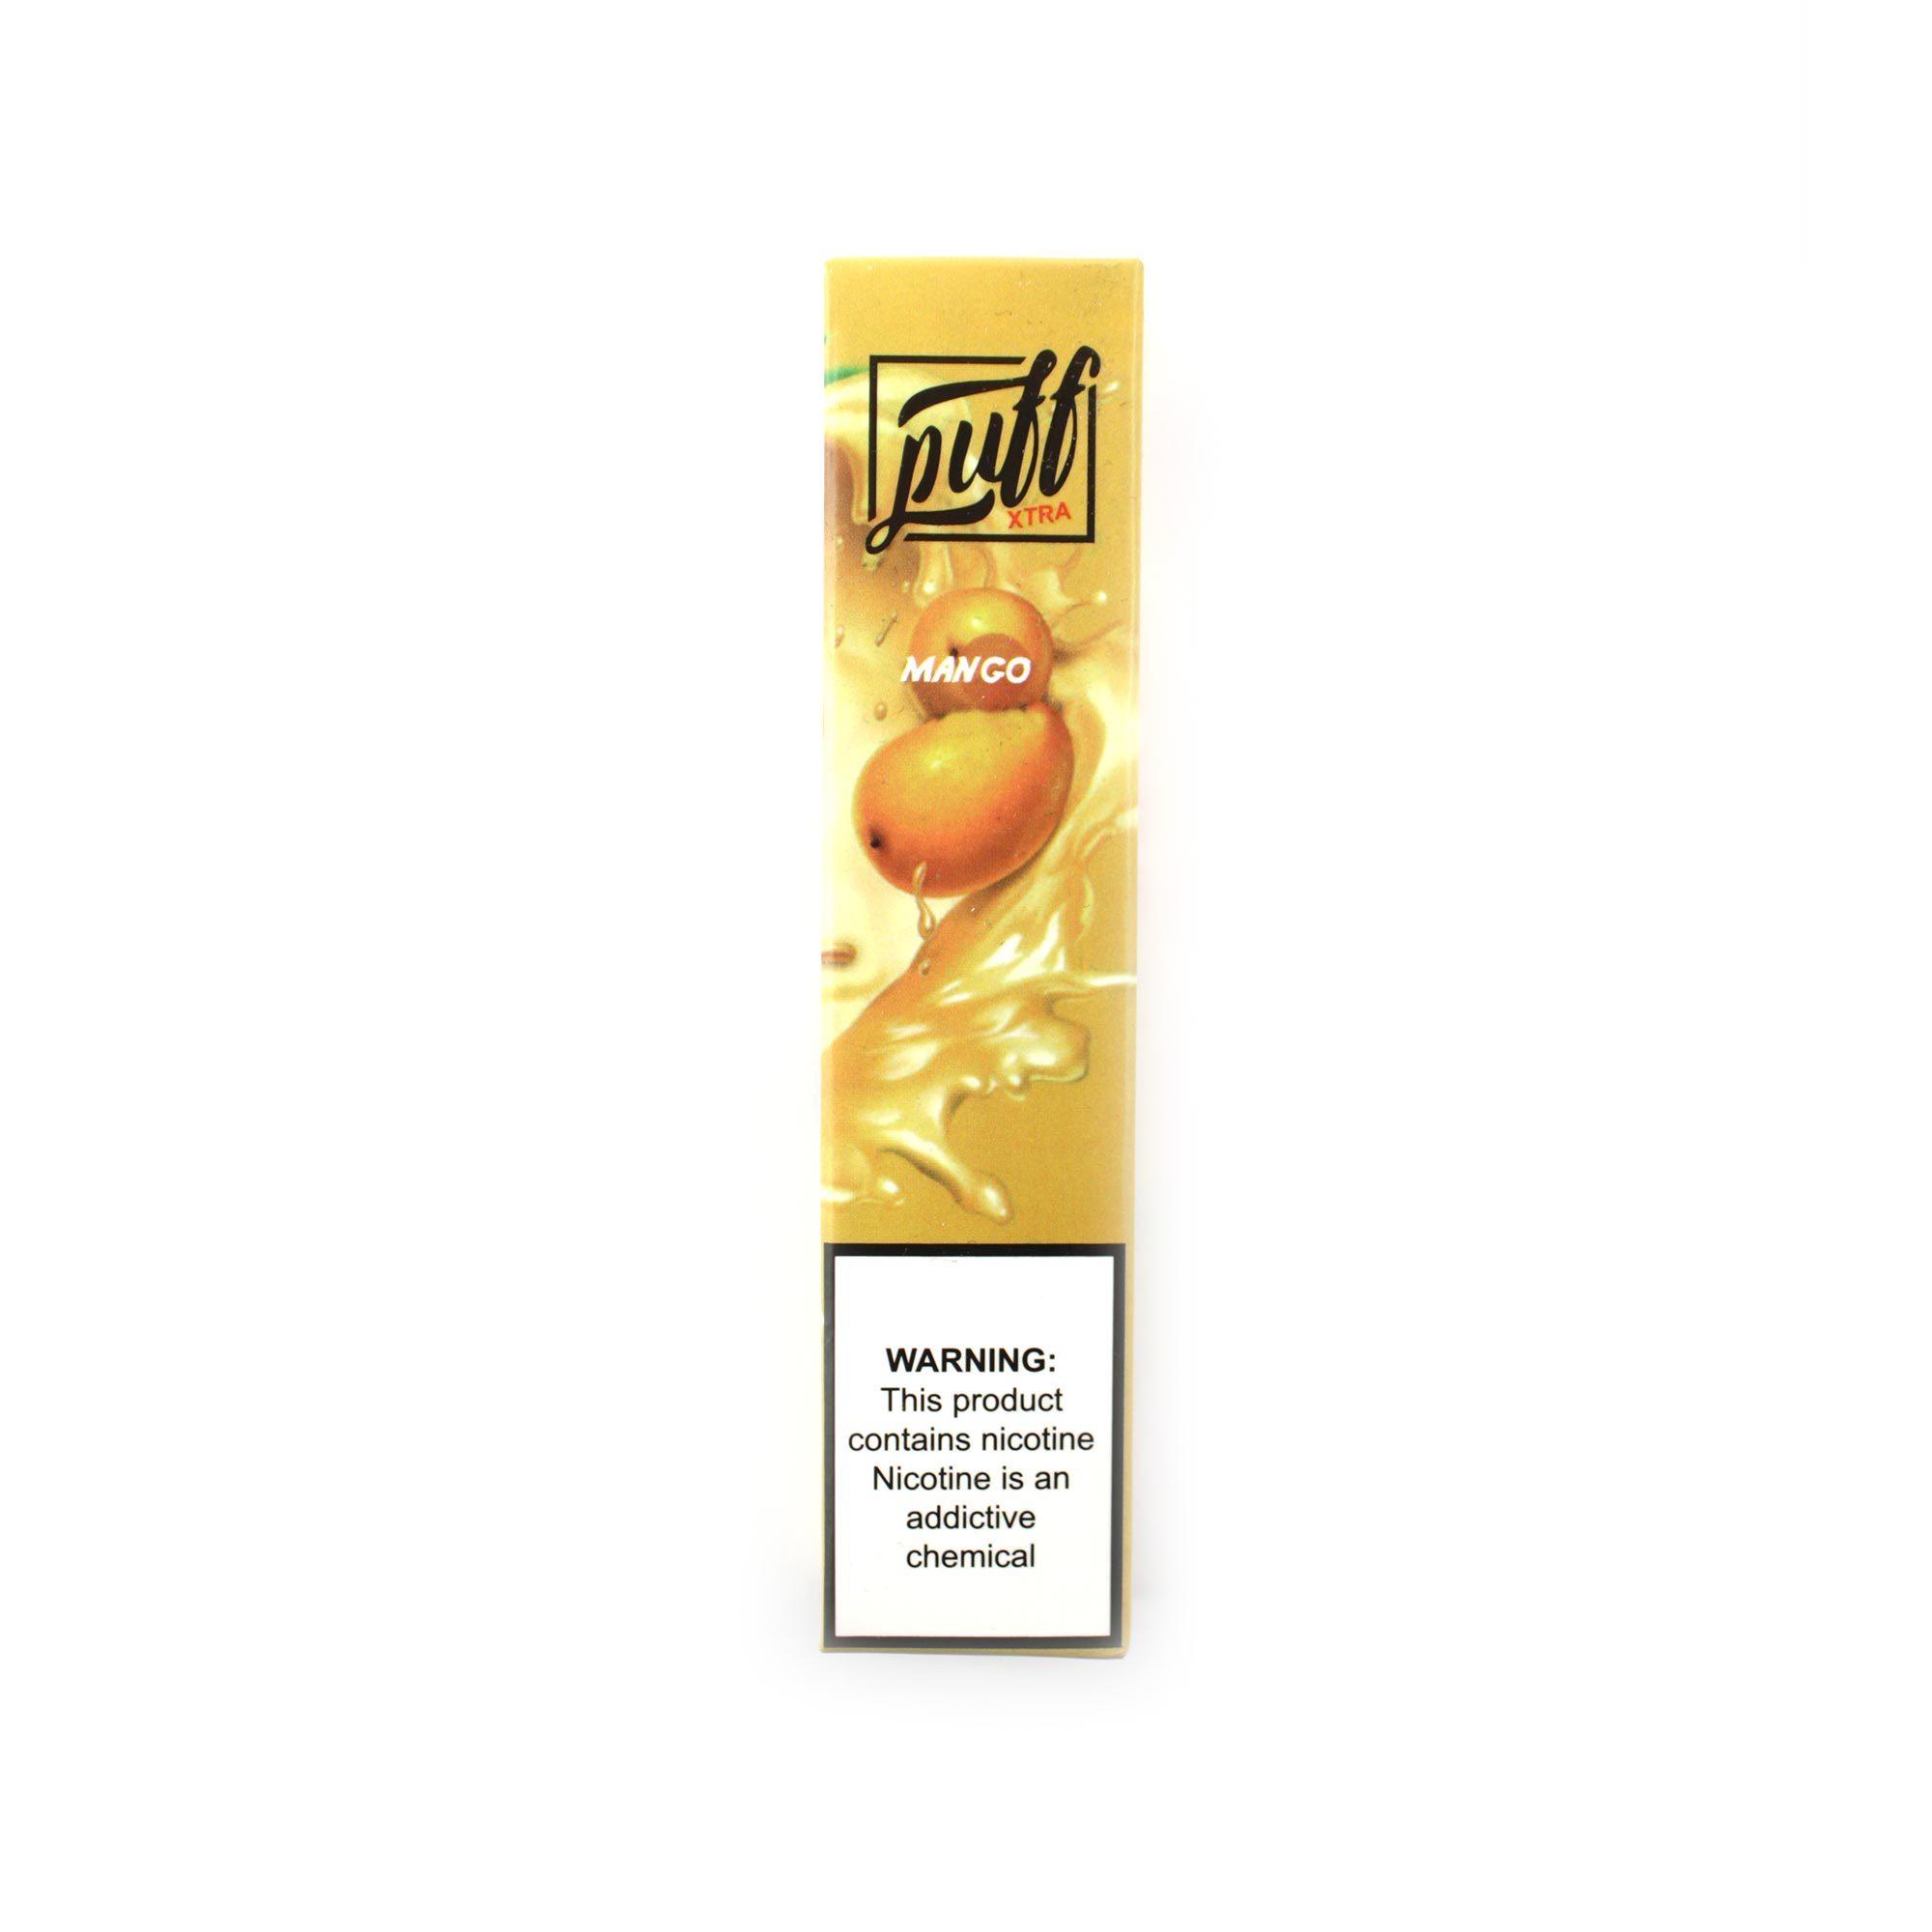 Одноразовая электронная сигарета Puff Extra Mango (Манго)